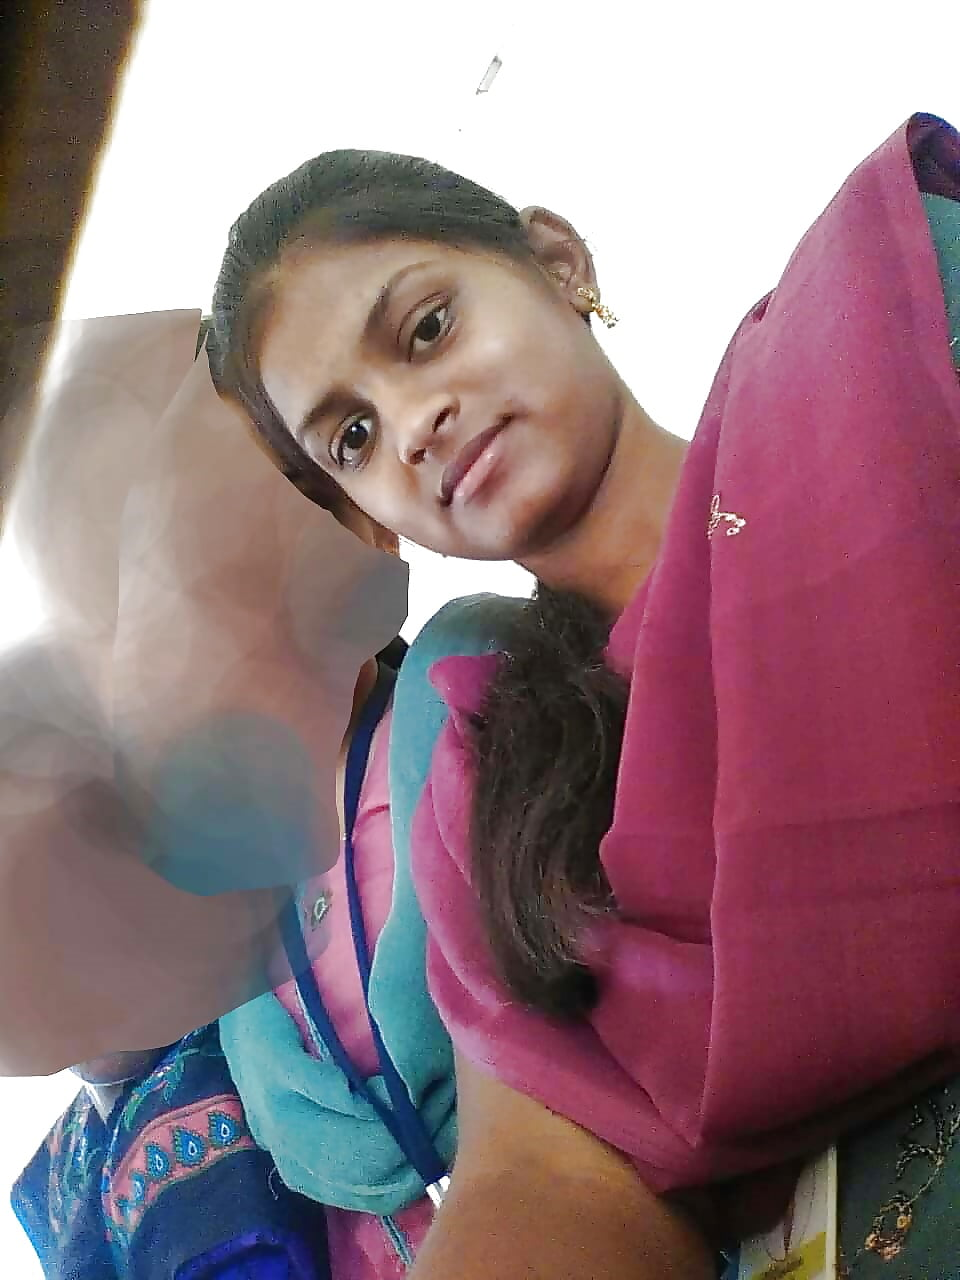 Srilankan Yalini Jaffna Collage Tamil Girl Show - 7 Pics -8359